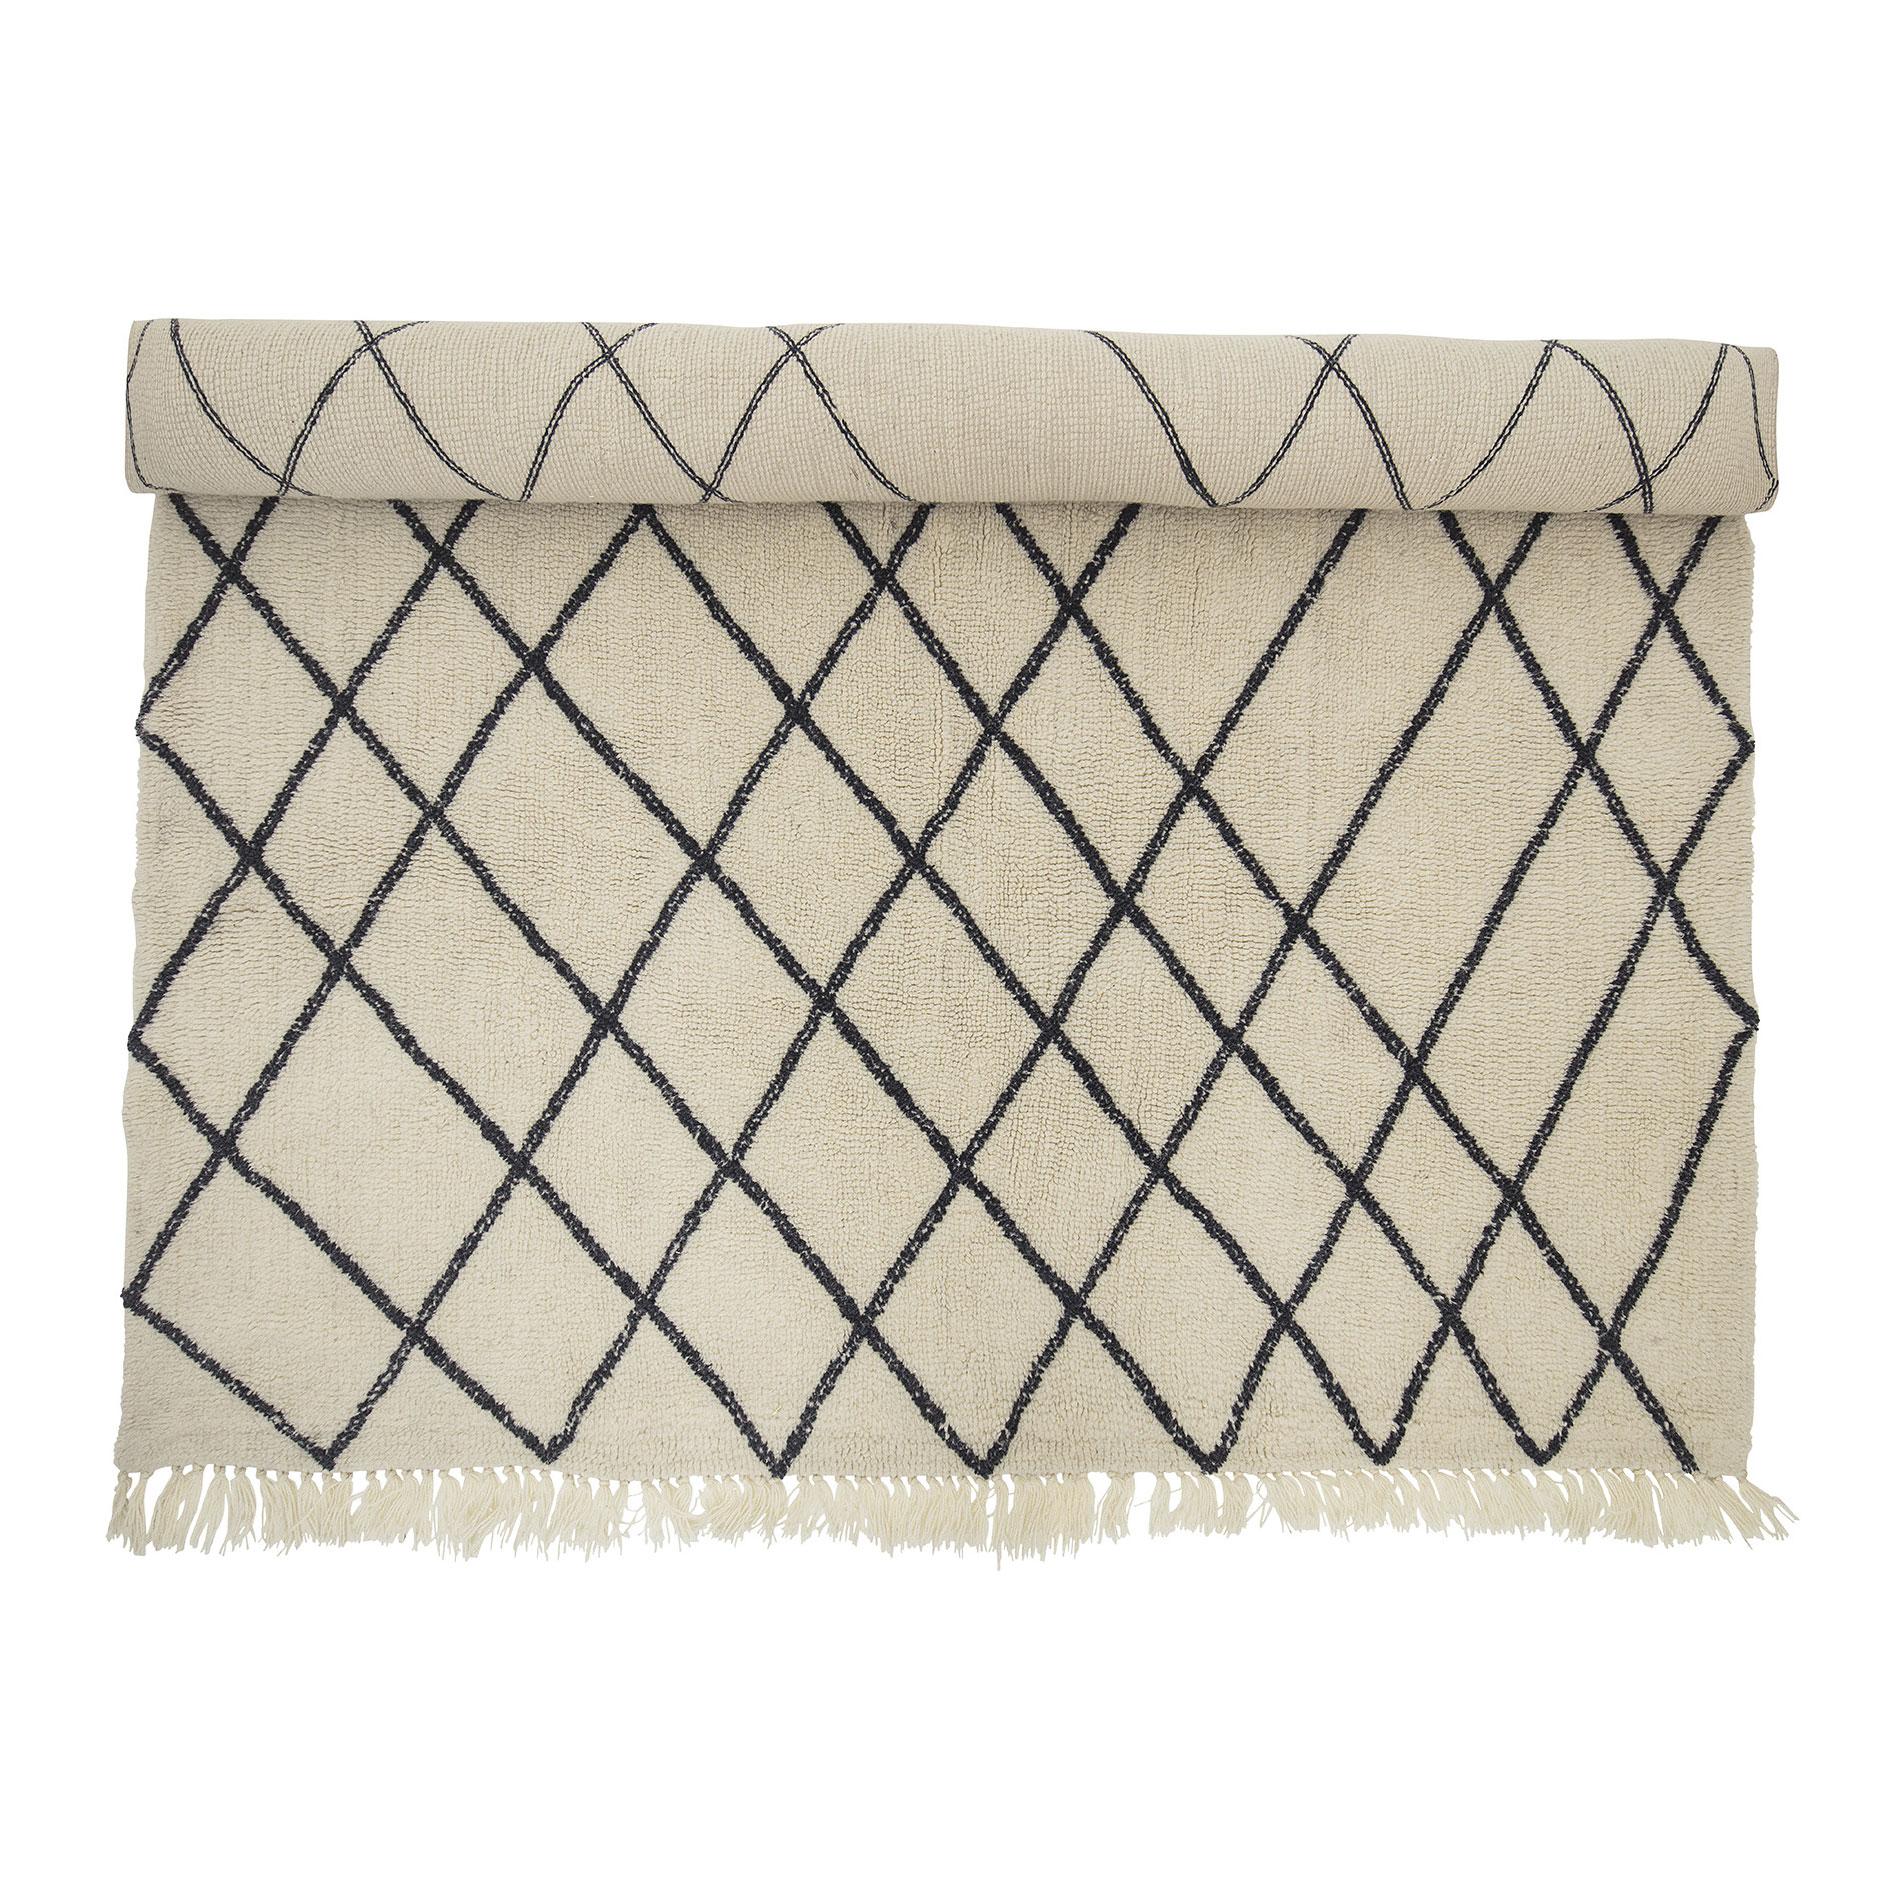 Tapete Berbere em lã natural, 200x300 cm